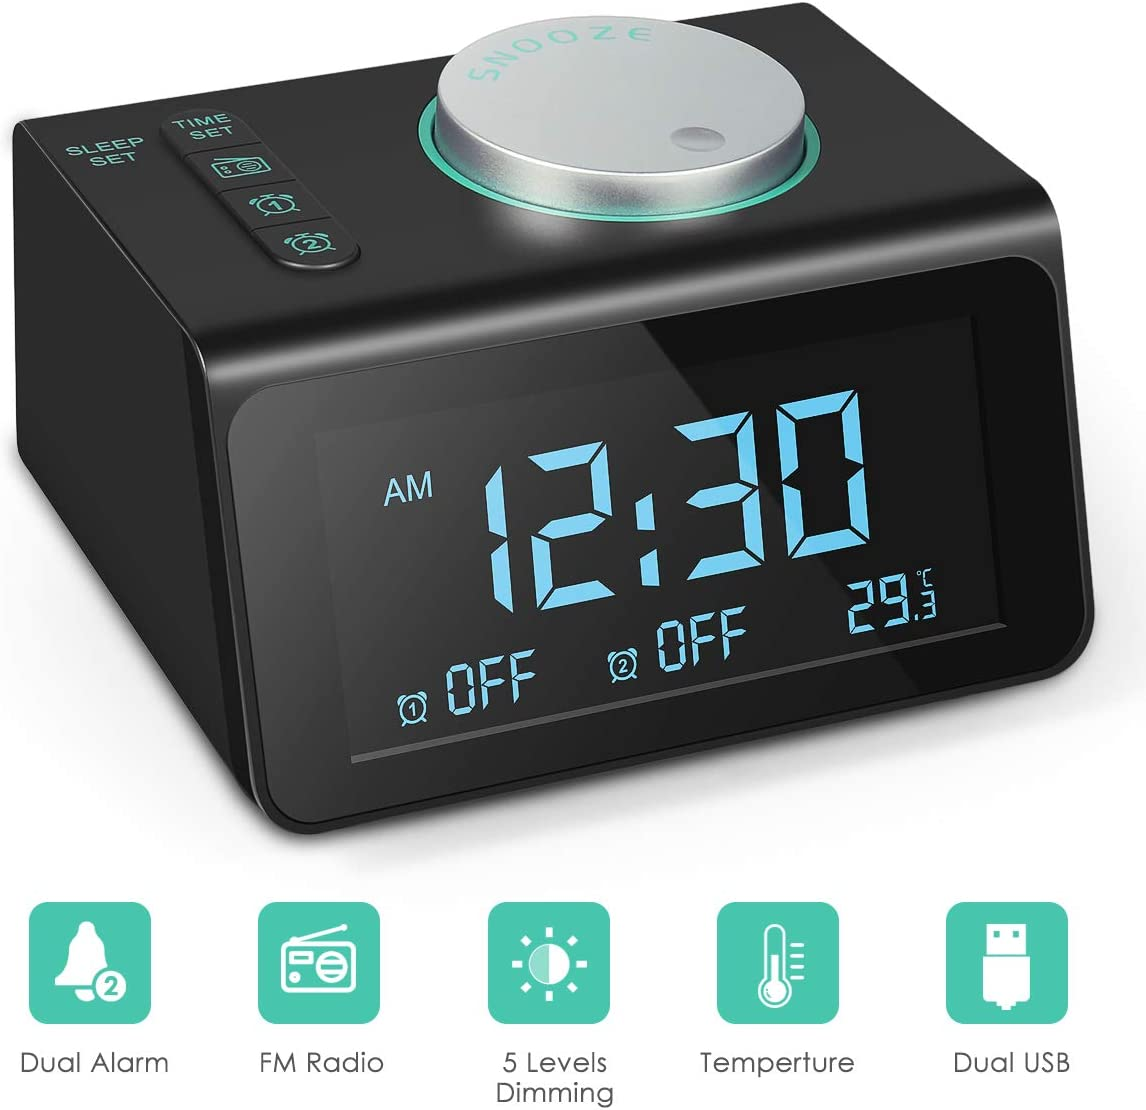 Vandoras Radio Alarm Clock, 2019 Upgraded FM Radio, Dual USB Charging Ports, Temperature Display, Dual Alarms with 7 Alarm Sounds, 5 Level Brightness Dimmer